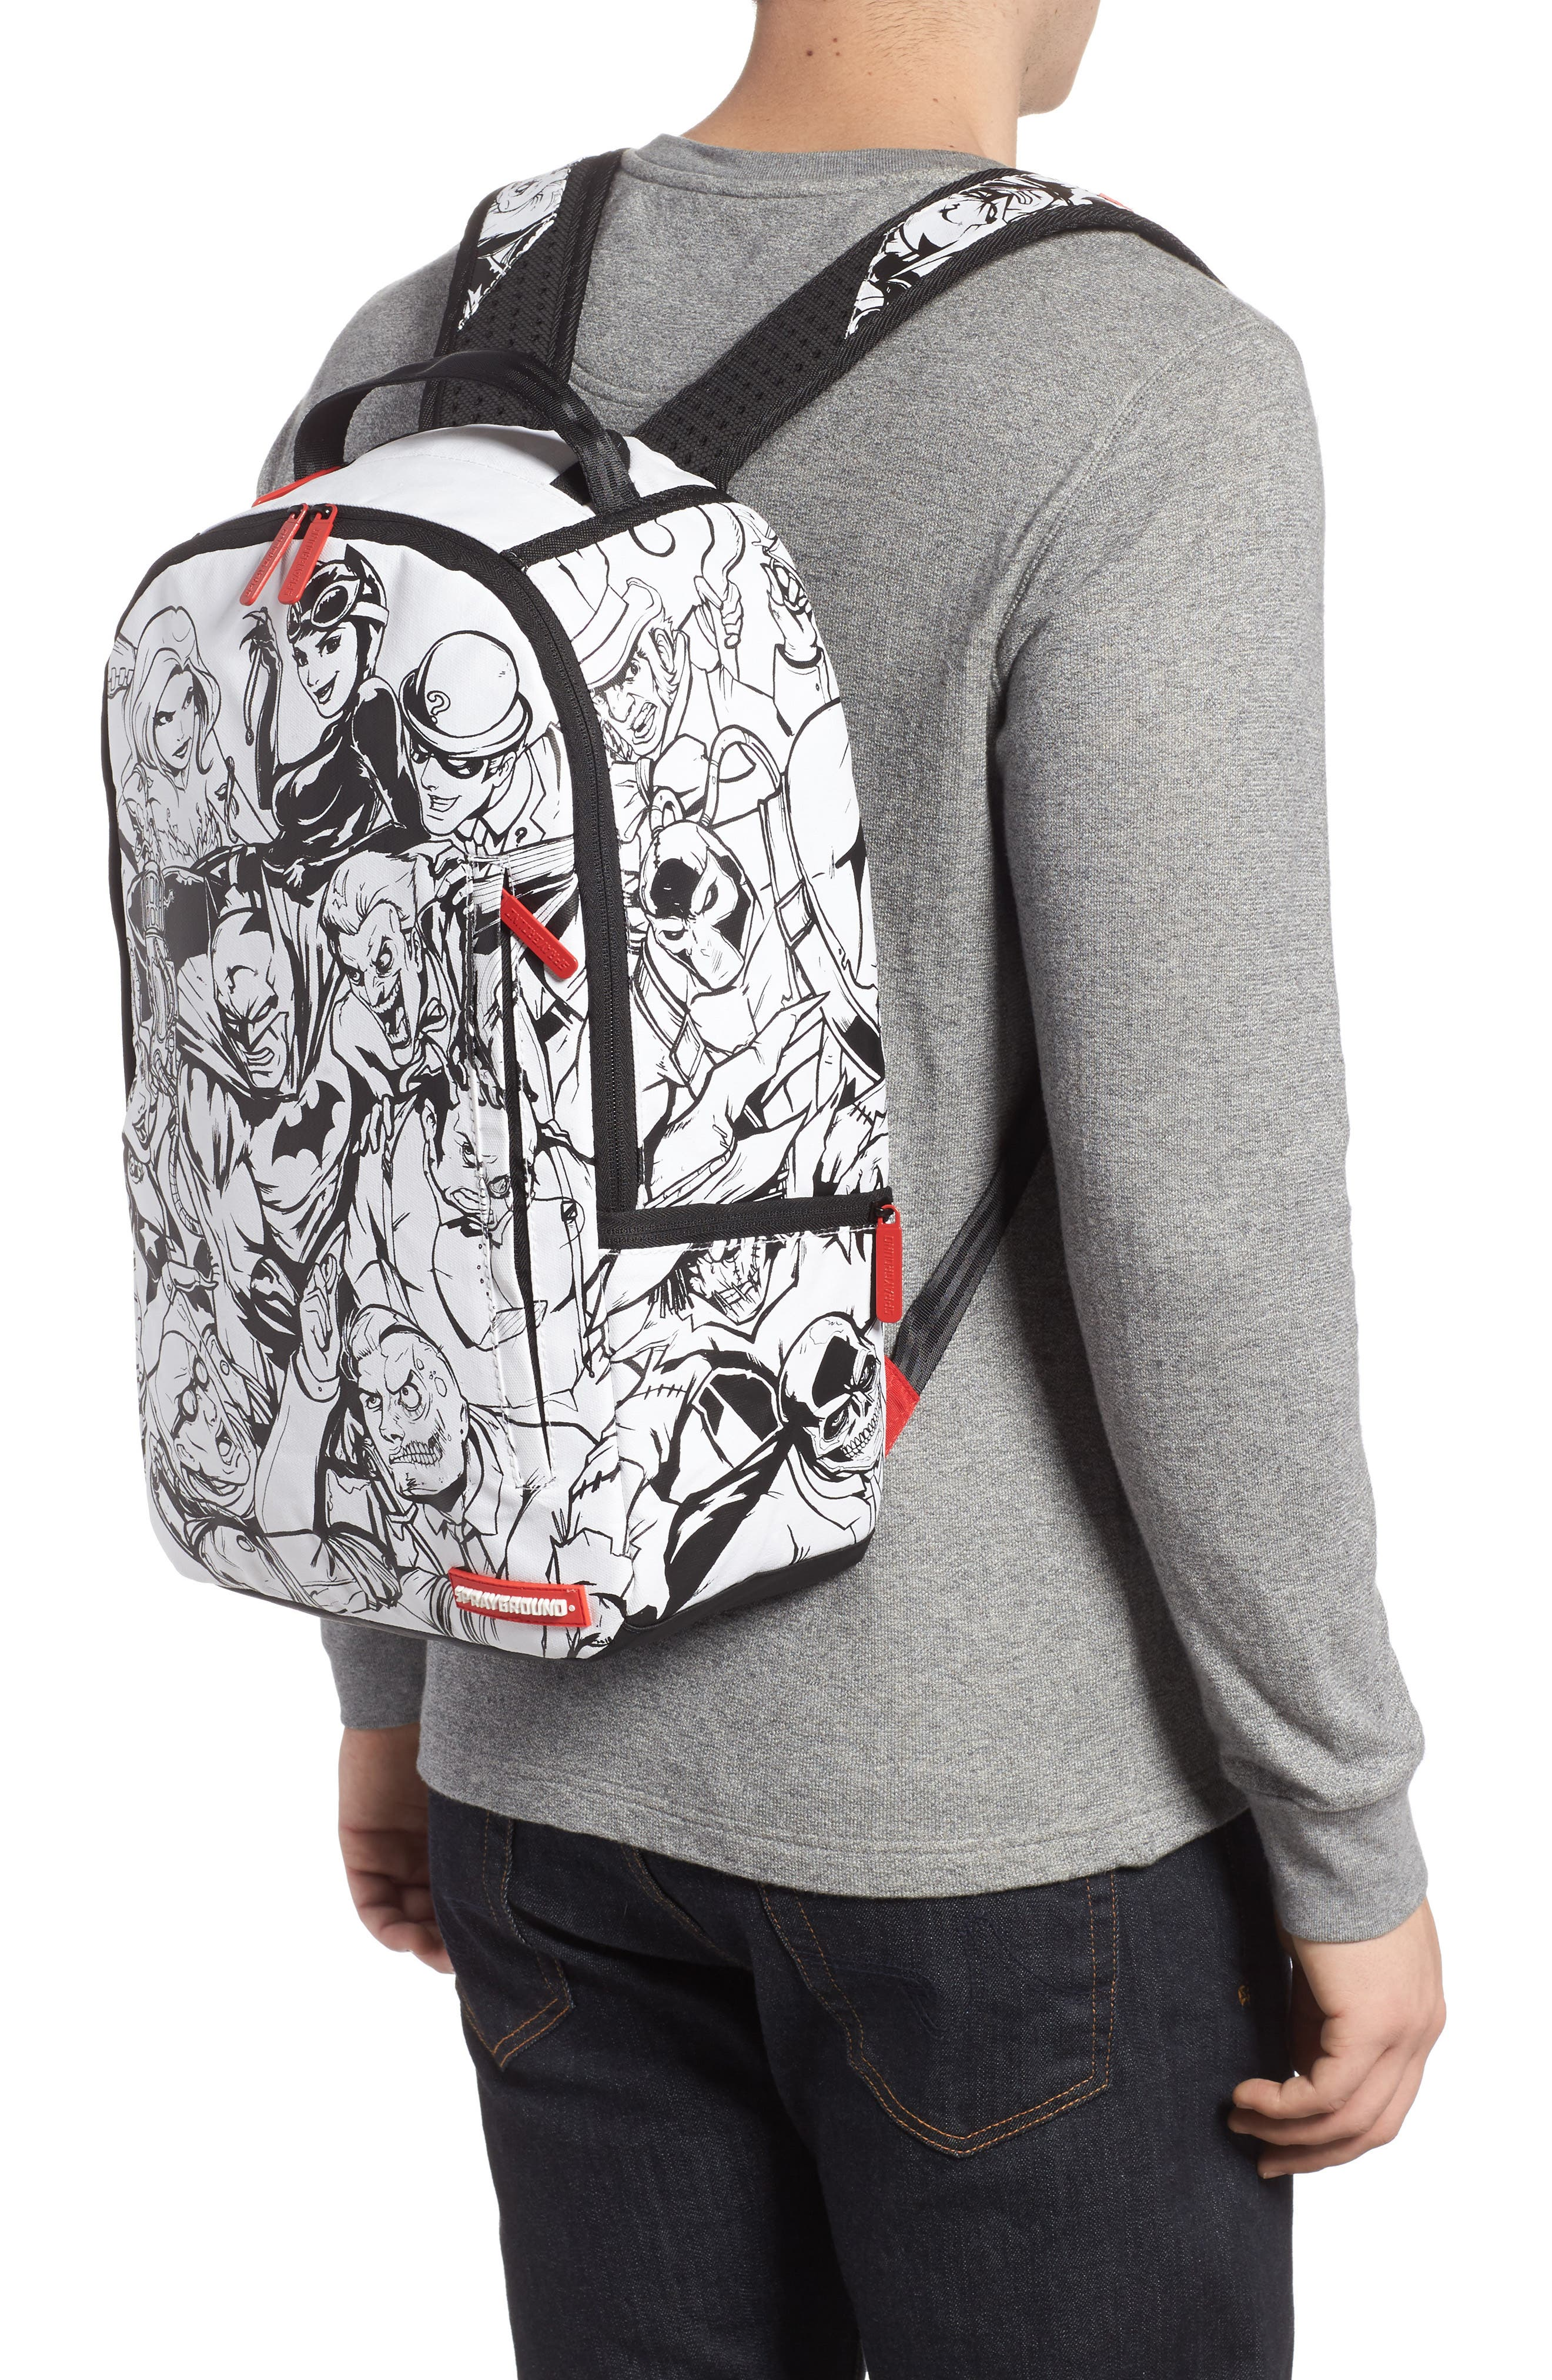 Batman DIY Villains Backpack,                             Alternate thumbnail 2, color,                             Black/ White